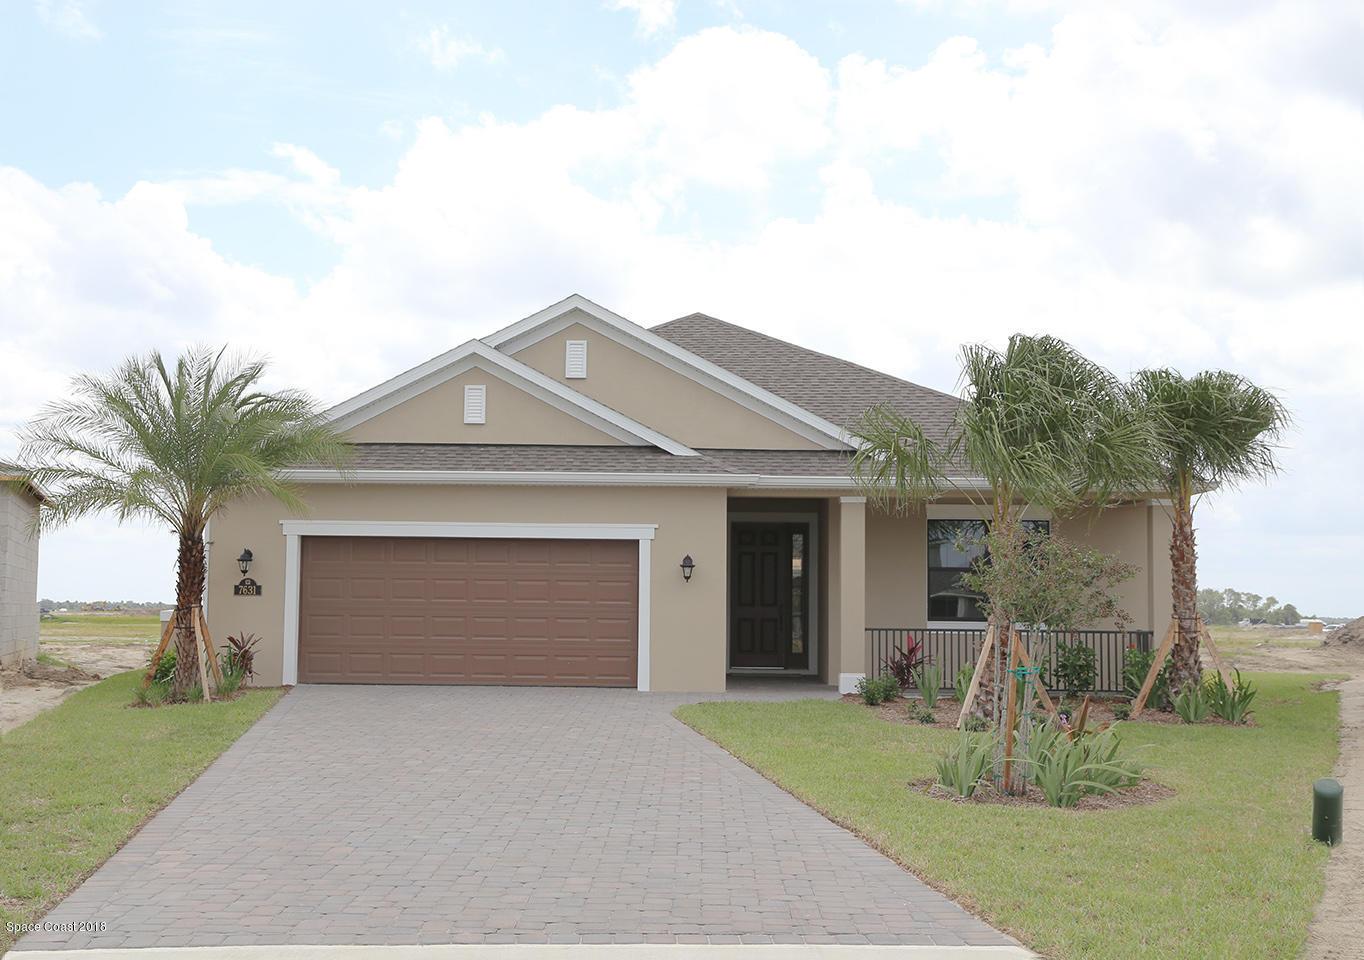 Property for Sale at 7631 Cislo 7631 Cislo Viera, Florida 32940 United States